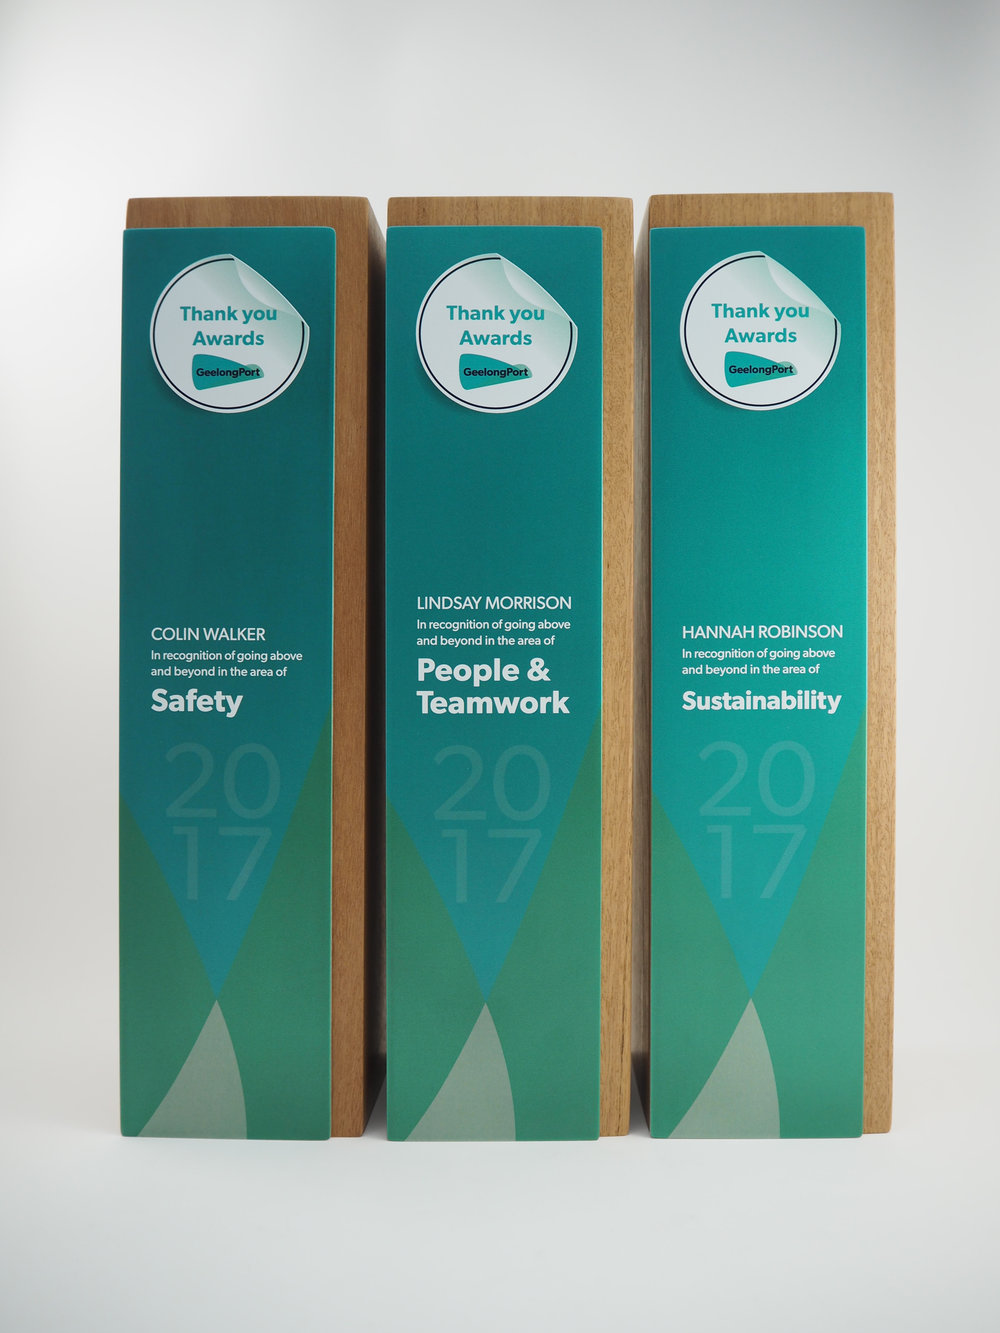 geelong-port-awards-reclaimed-timber-eco-aluminium-trophy-07.jpg